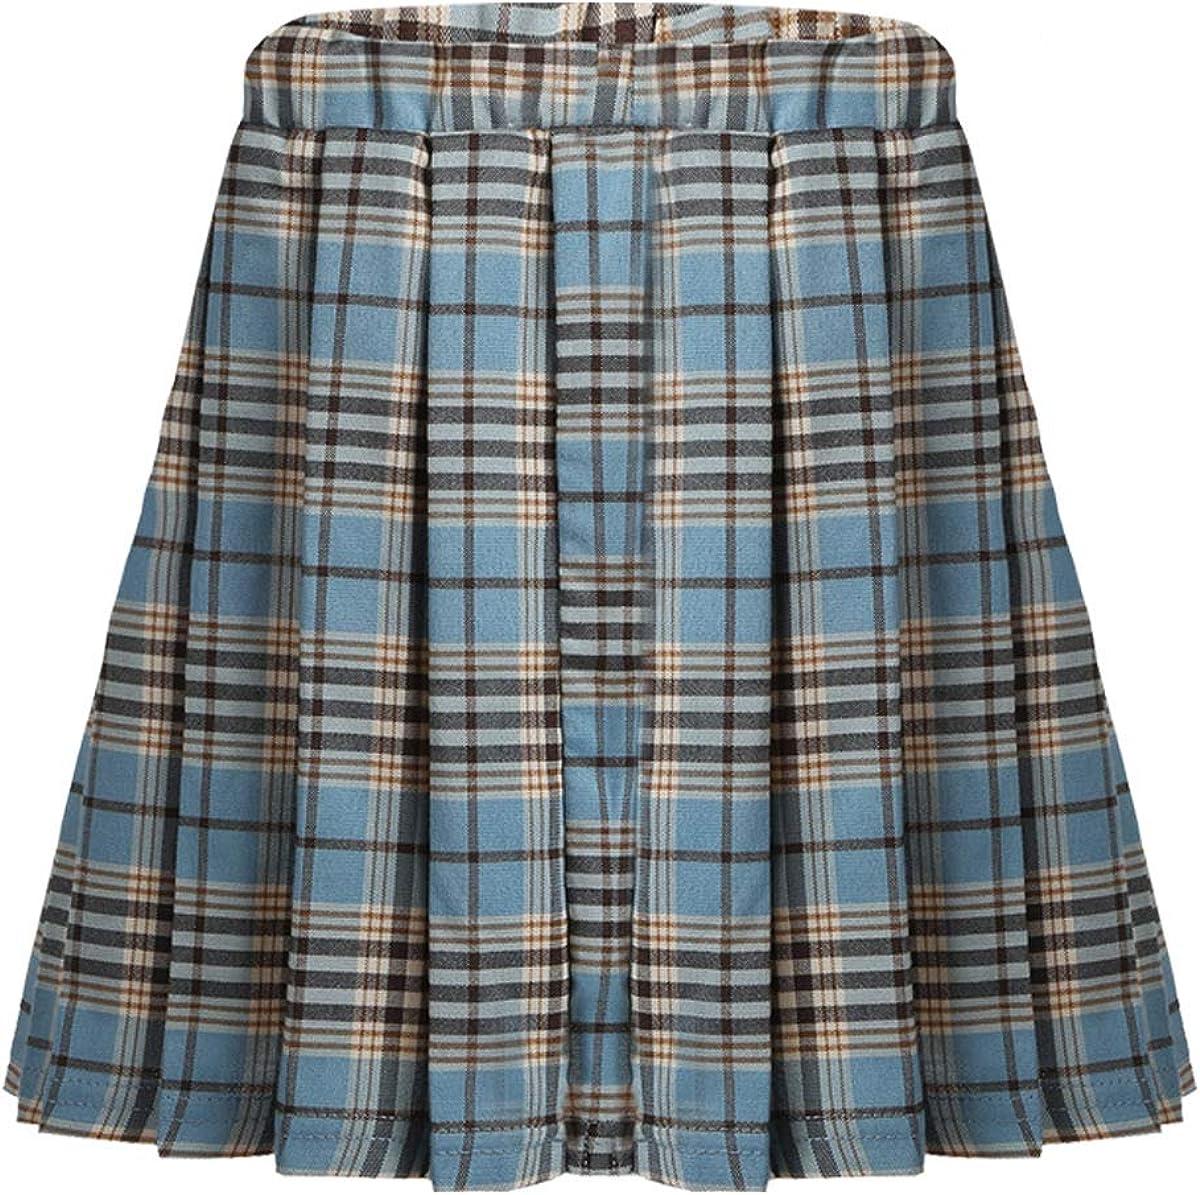 Freebily Kids Girls Classical School Skirts Tennis Bombing free shipping Uniforms Clearance SALE Limited time A-Li